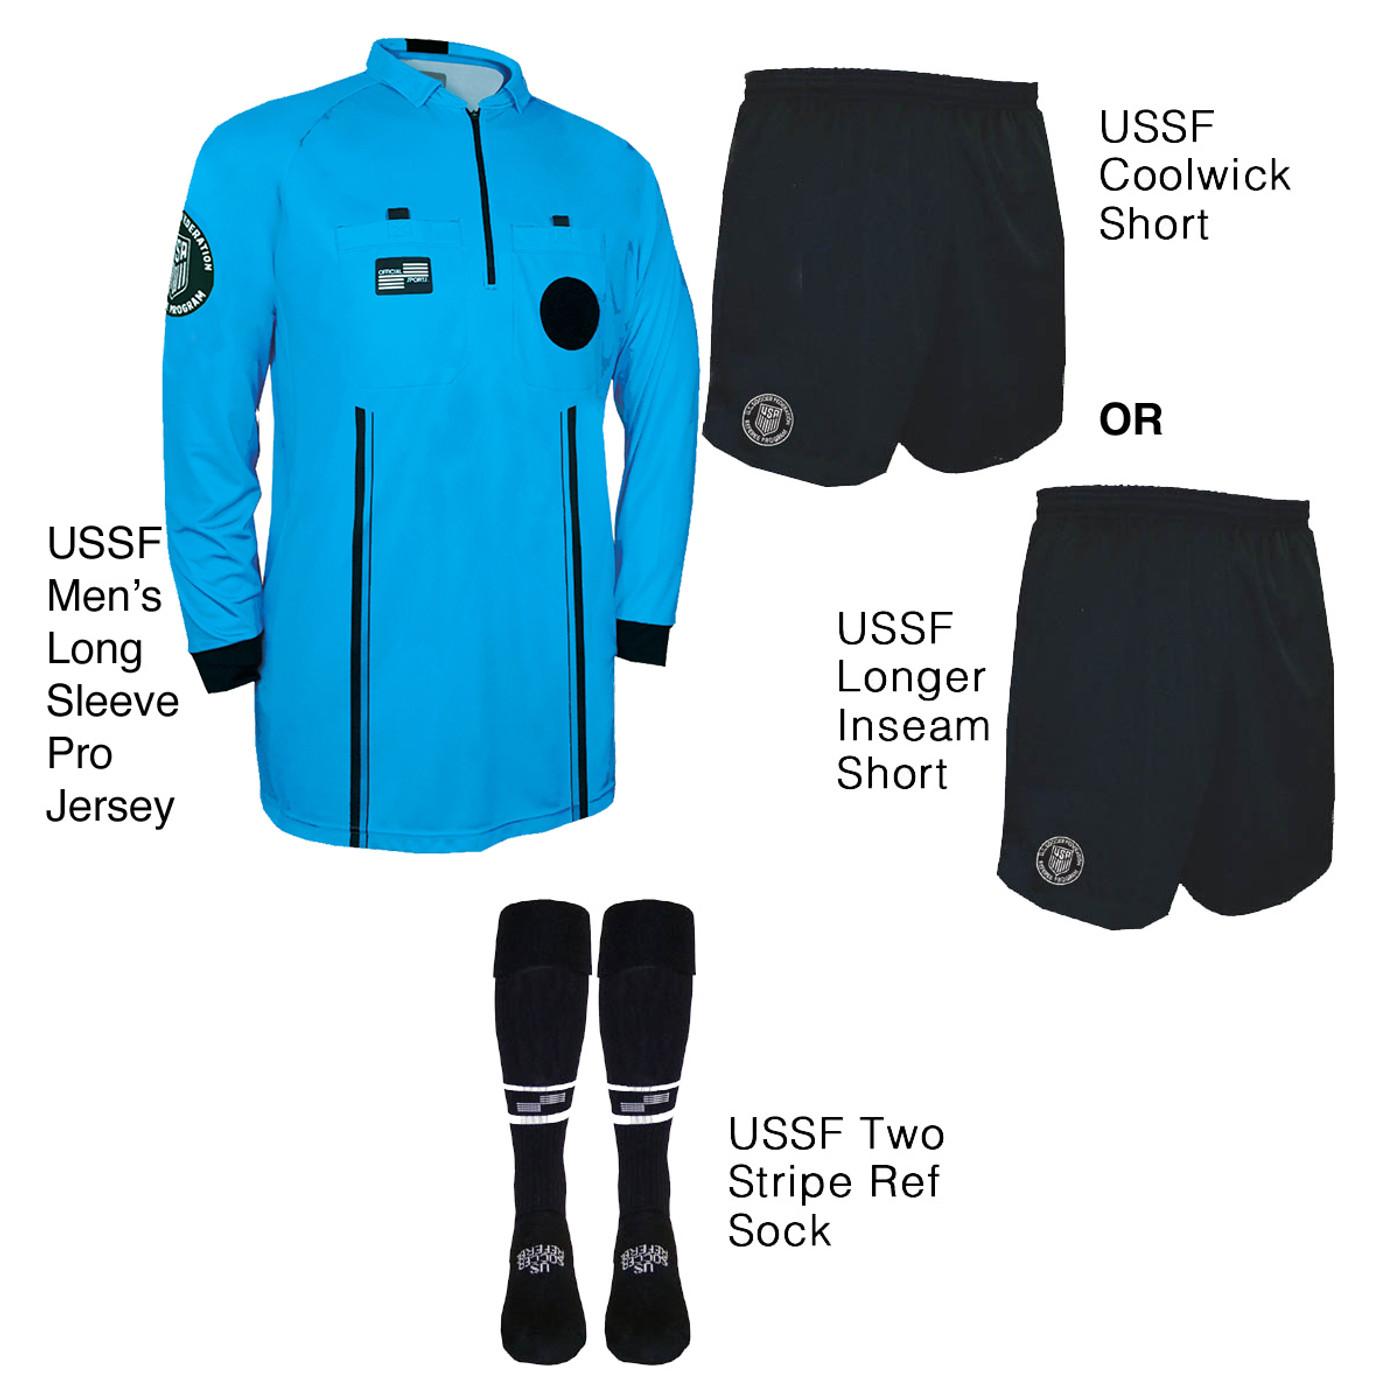 9901BLU Men's Blue Pro Long Sleeve Kit